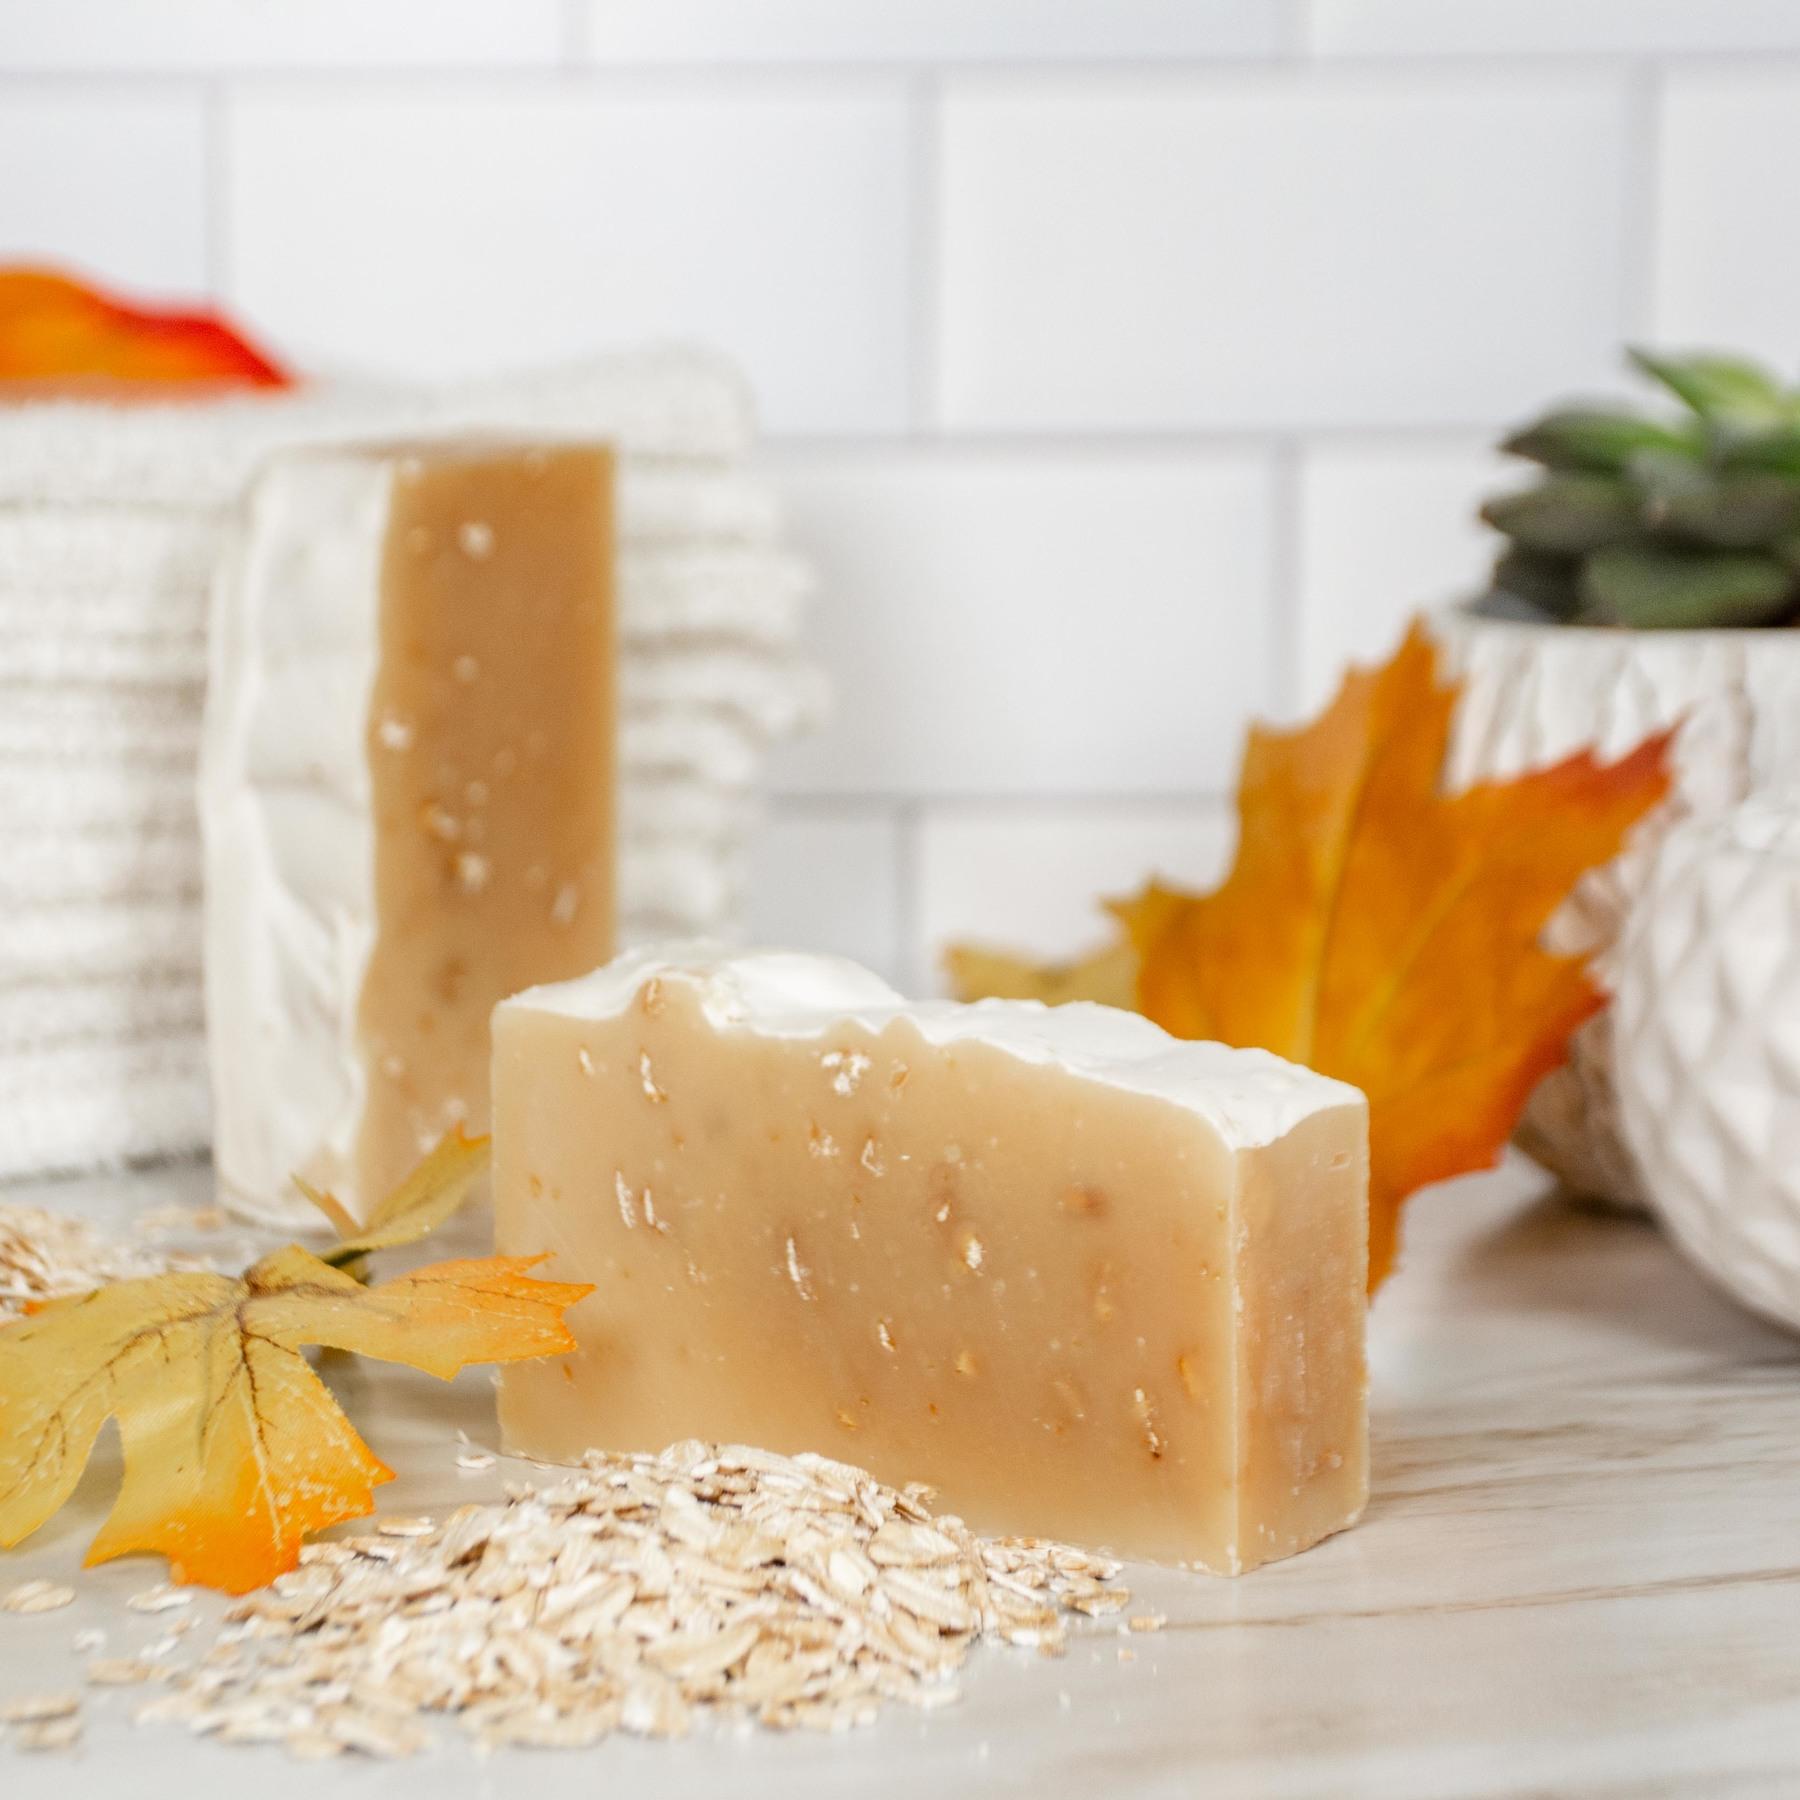 goat milk soap purity scrub